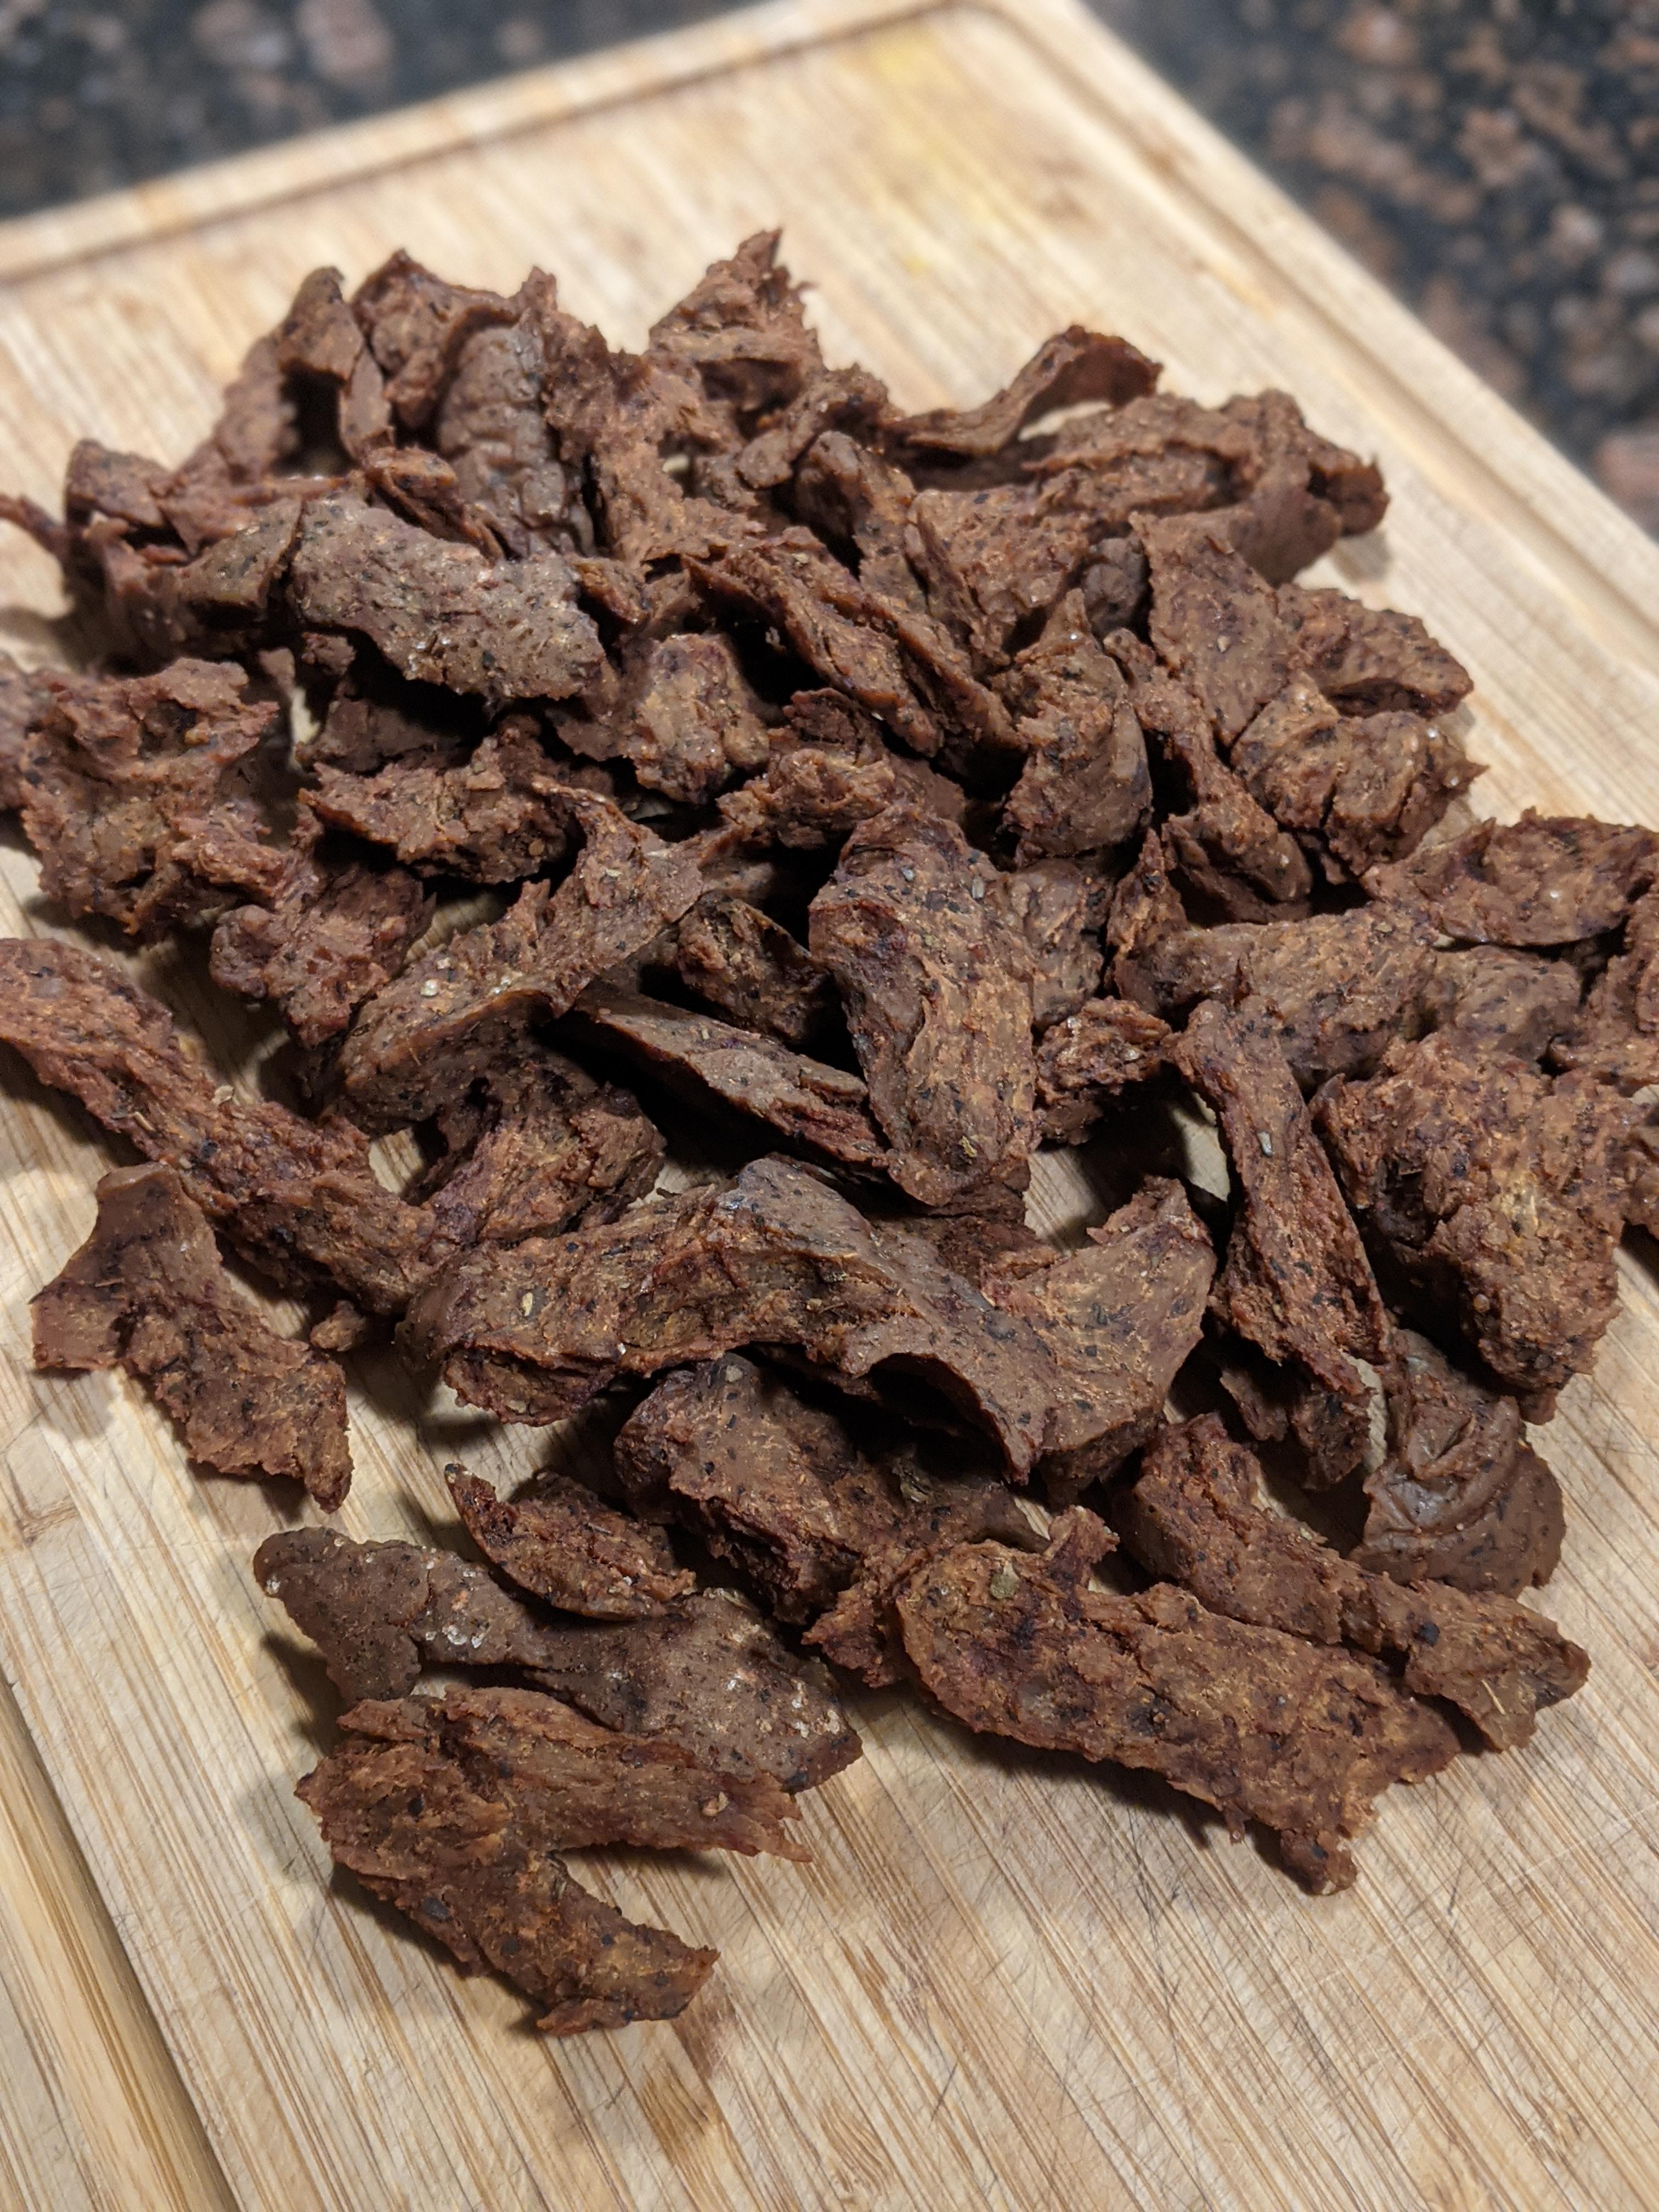 Vegan Beef Jerky Made with Setian